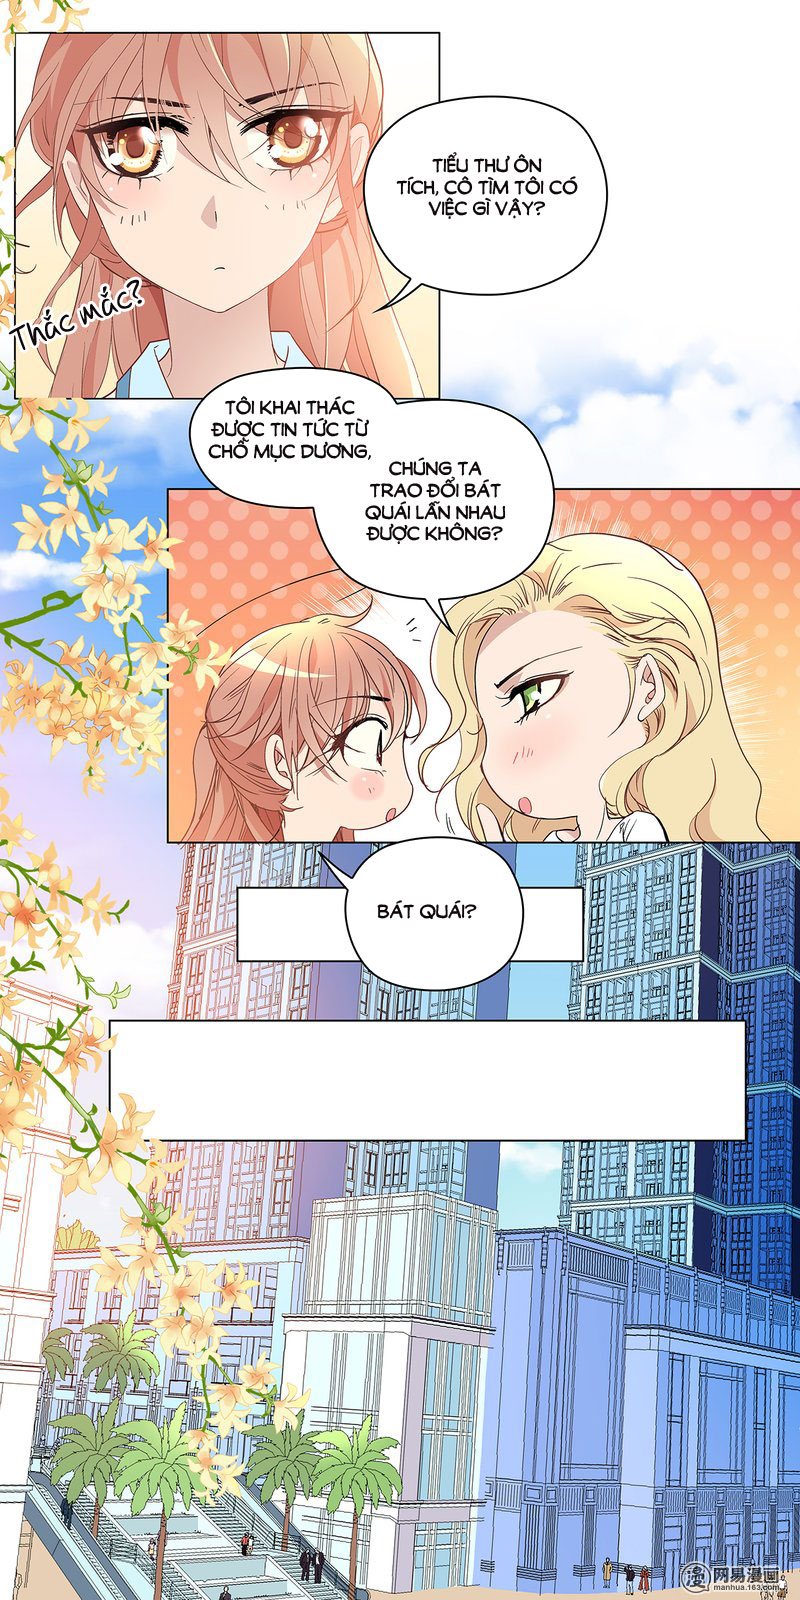 Mai Nữ Đồng Tiểu Nộ Chapter 40 - Truyenmoi.xyz